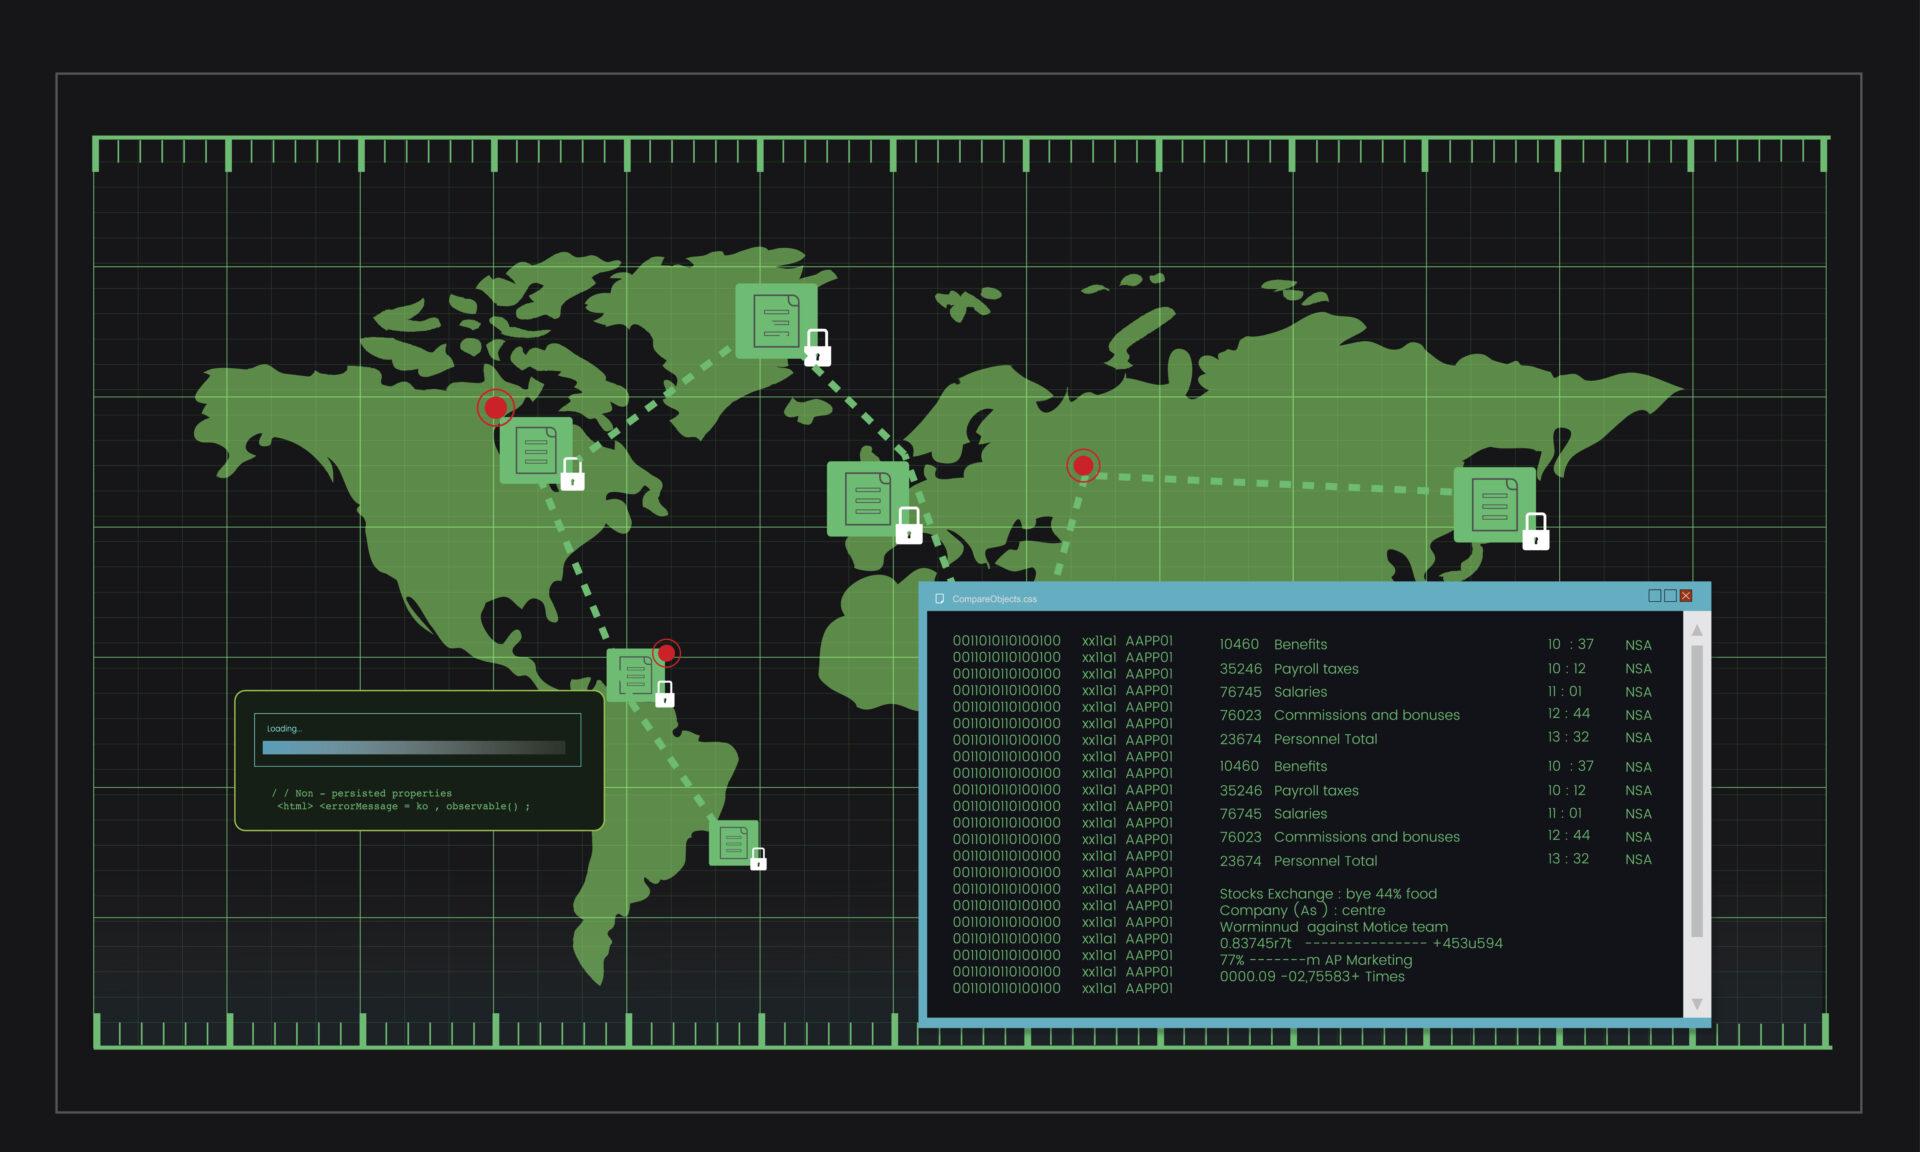 Illustration of computer hacking code